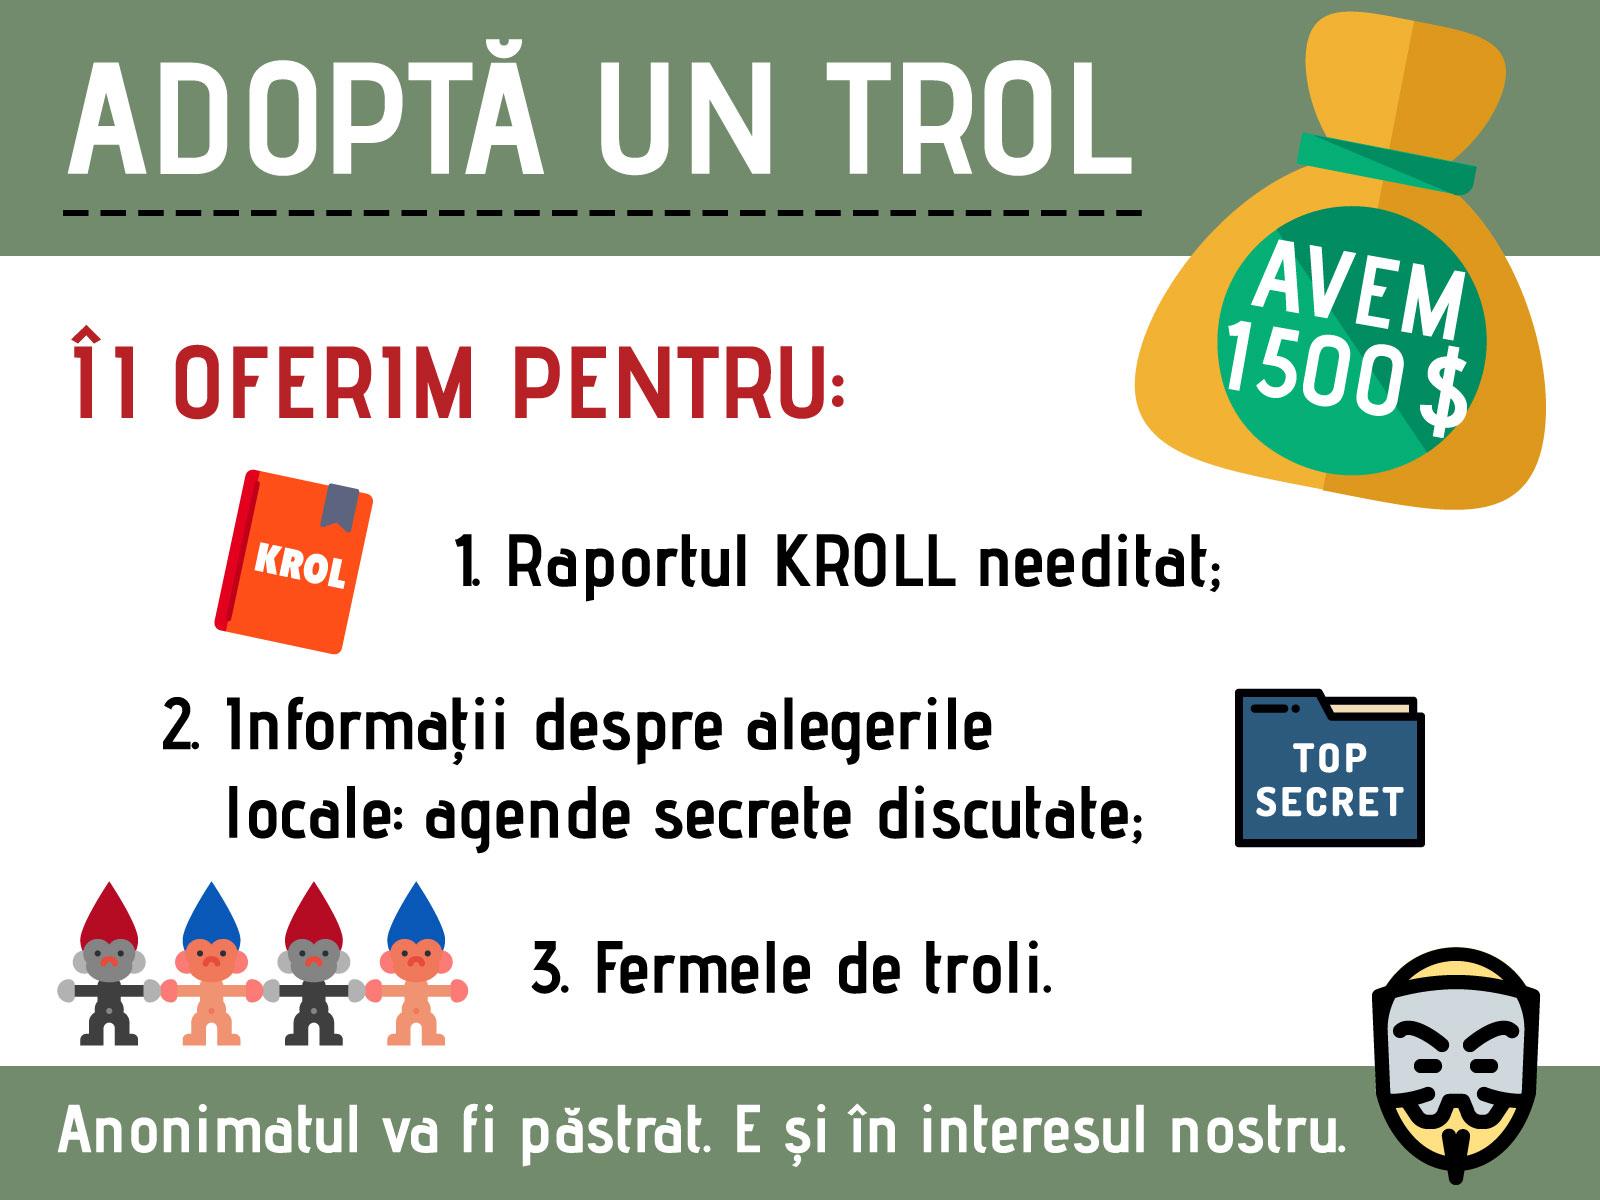 """Adoptă un trol"" a adunat 1500 de dolari: S-a încheiat campania de crowdfunding"